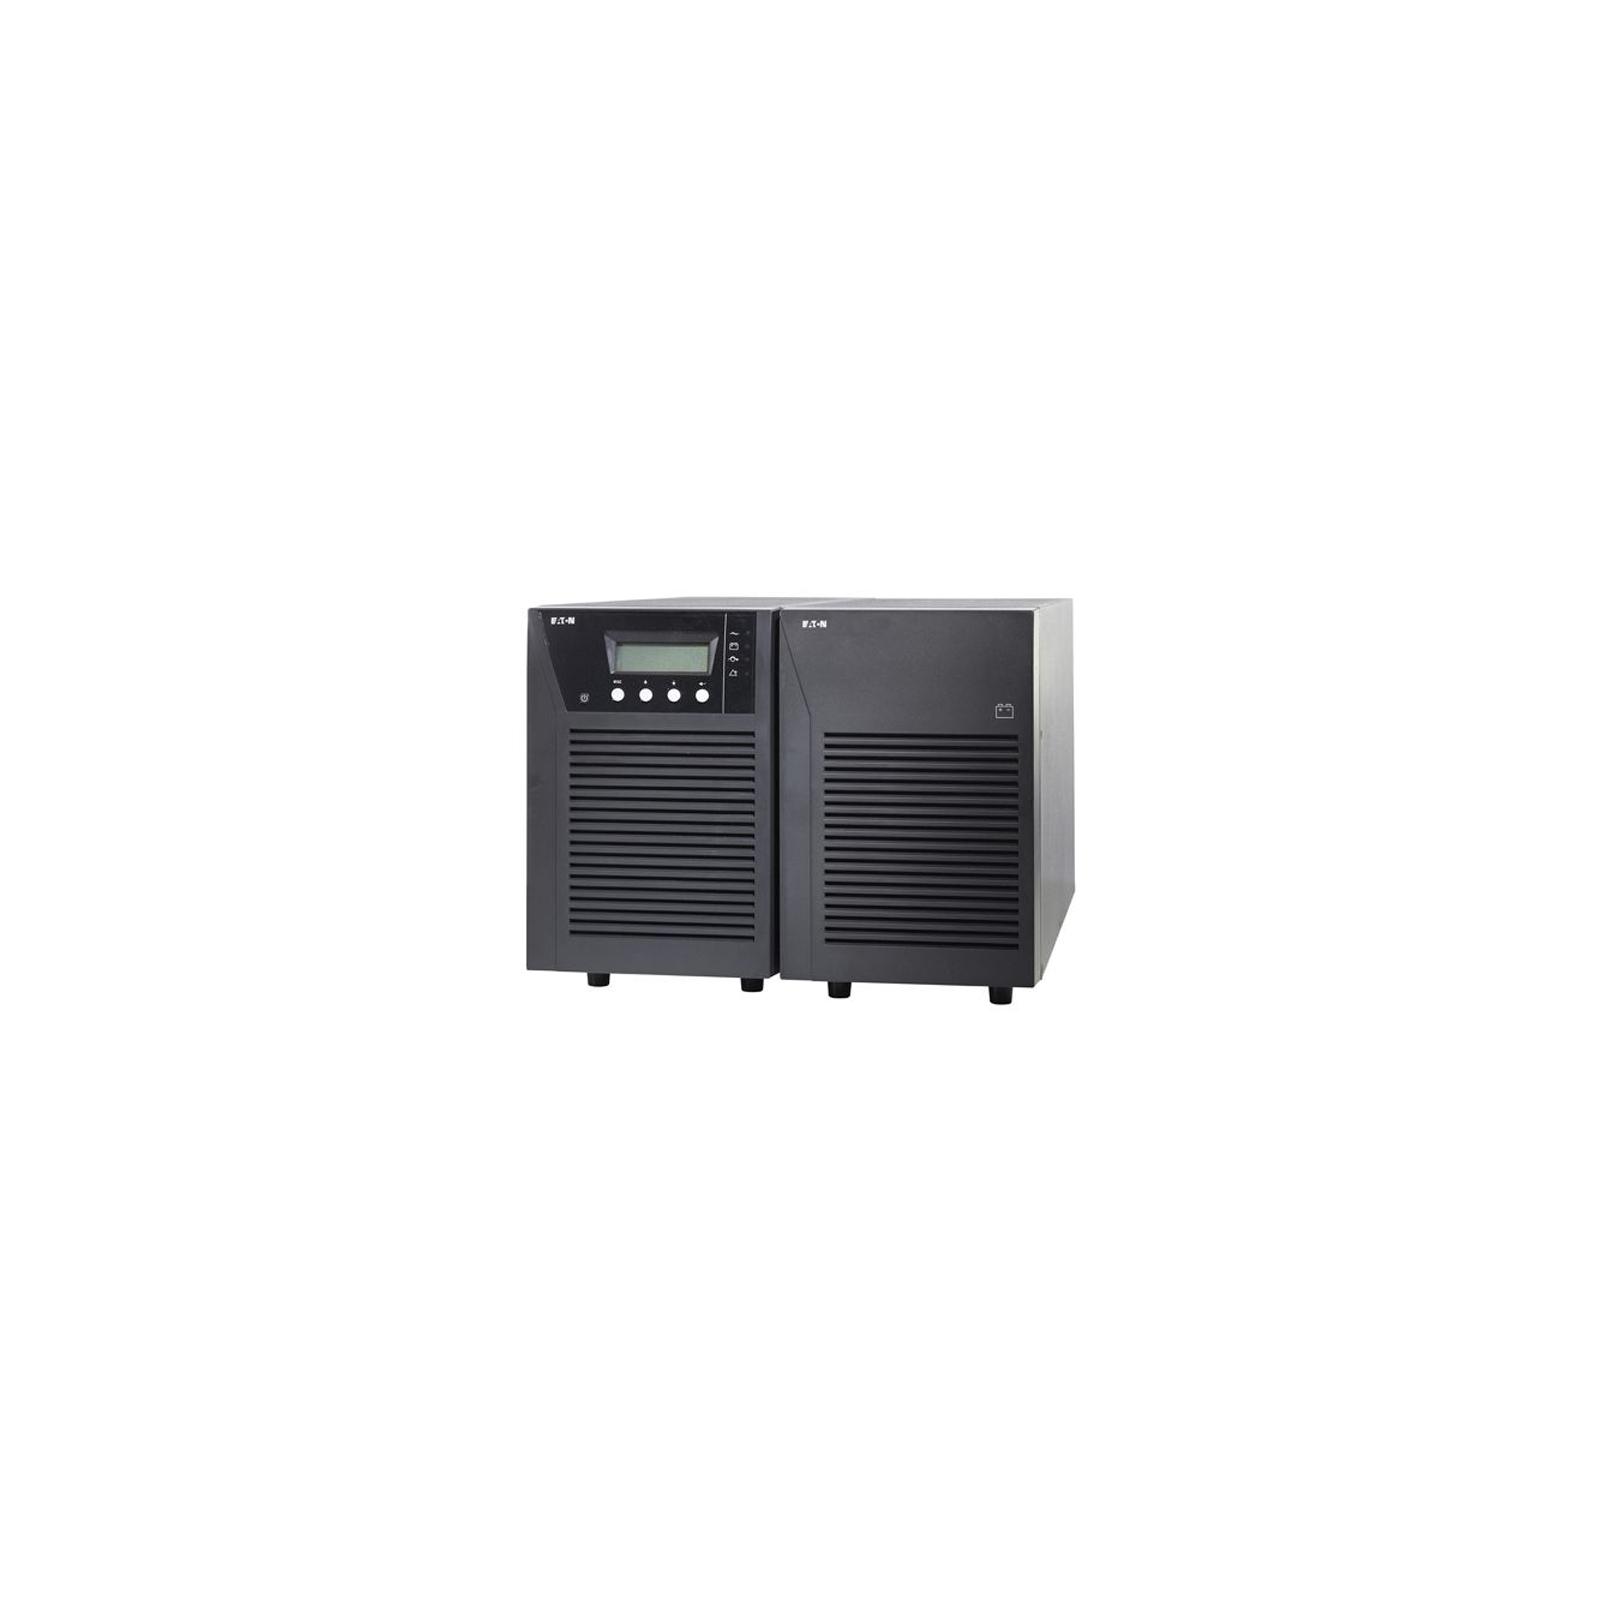 Батарея к ИБП Eaton Eaton 9130 1500VA (103006439-6591) изображение 3